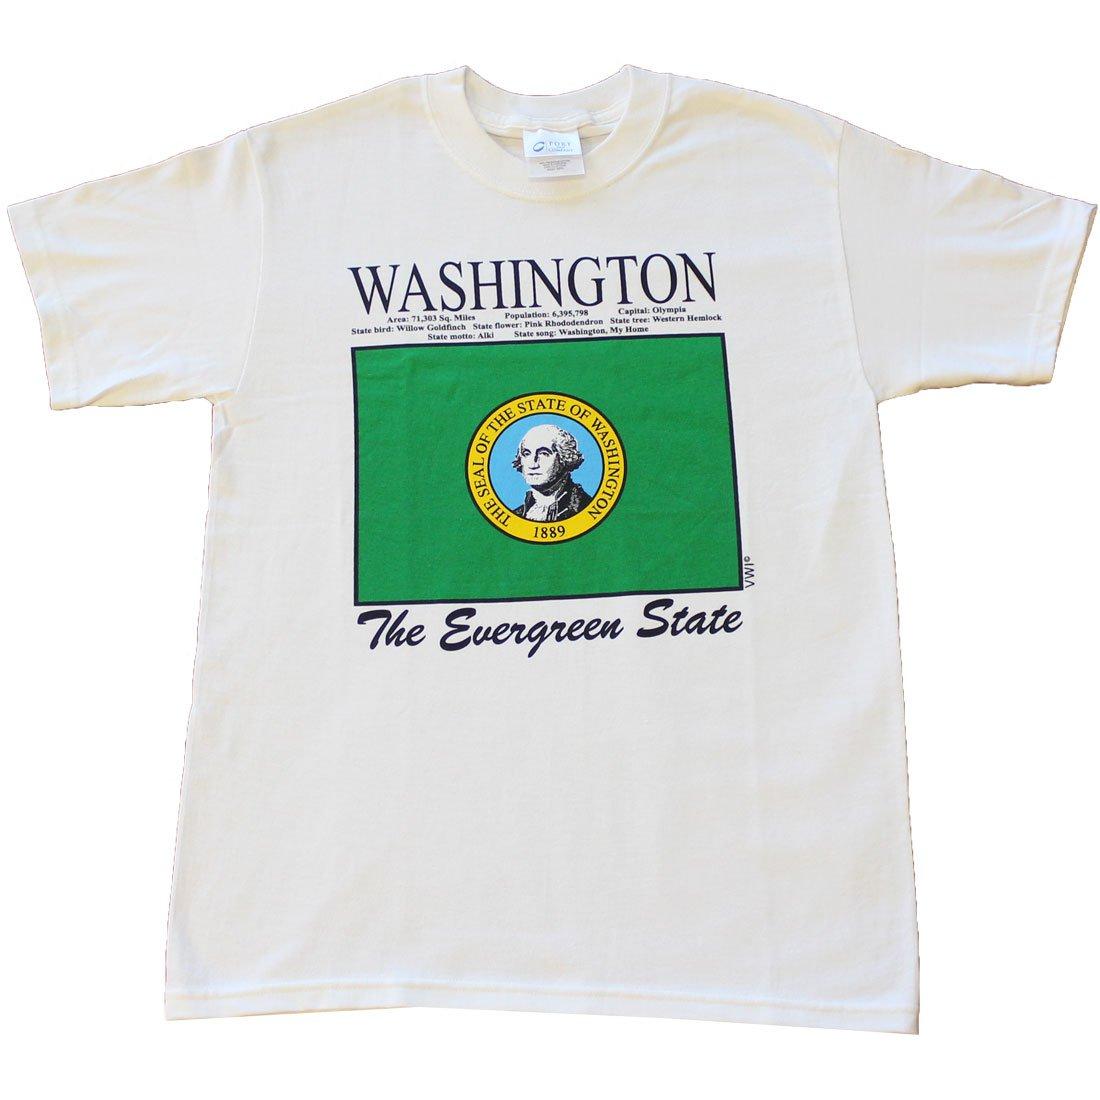 Washington State T-Shirt (M)